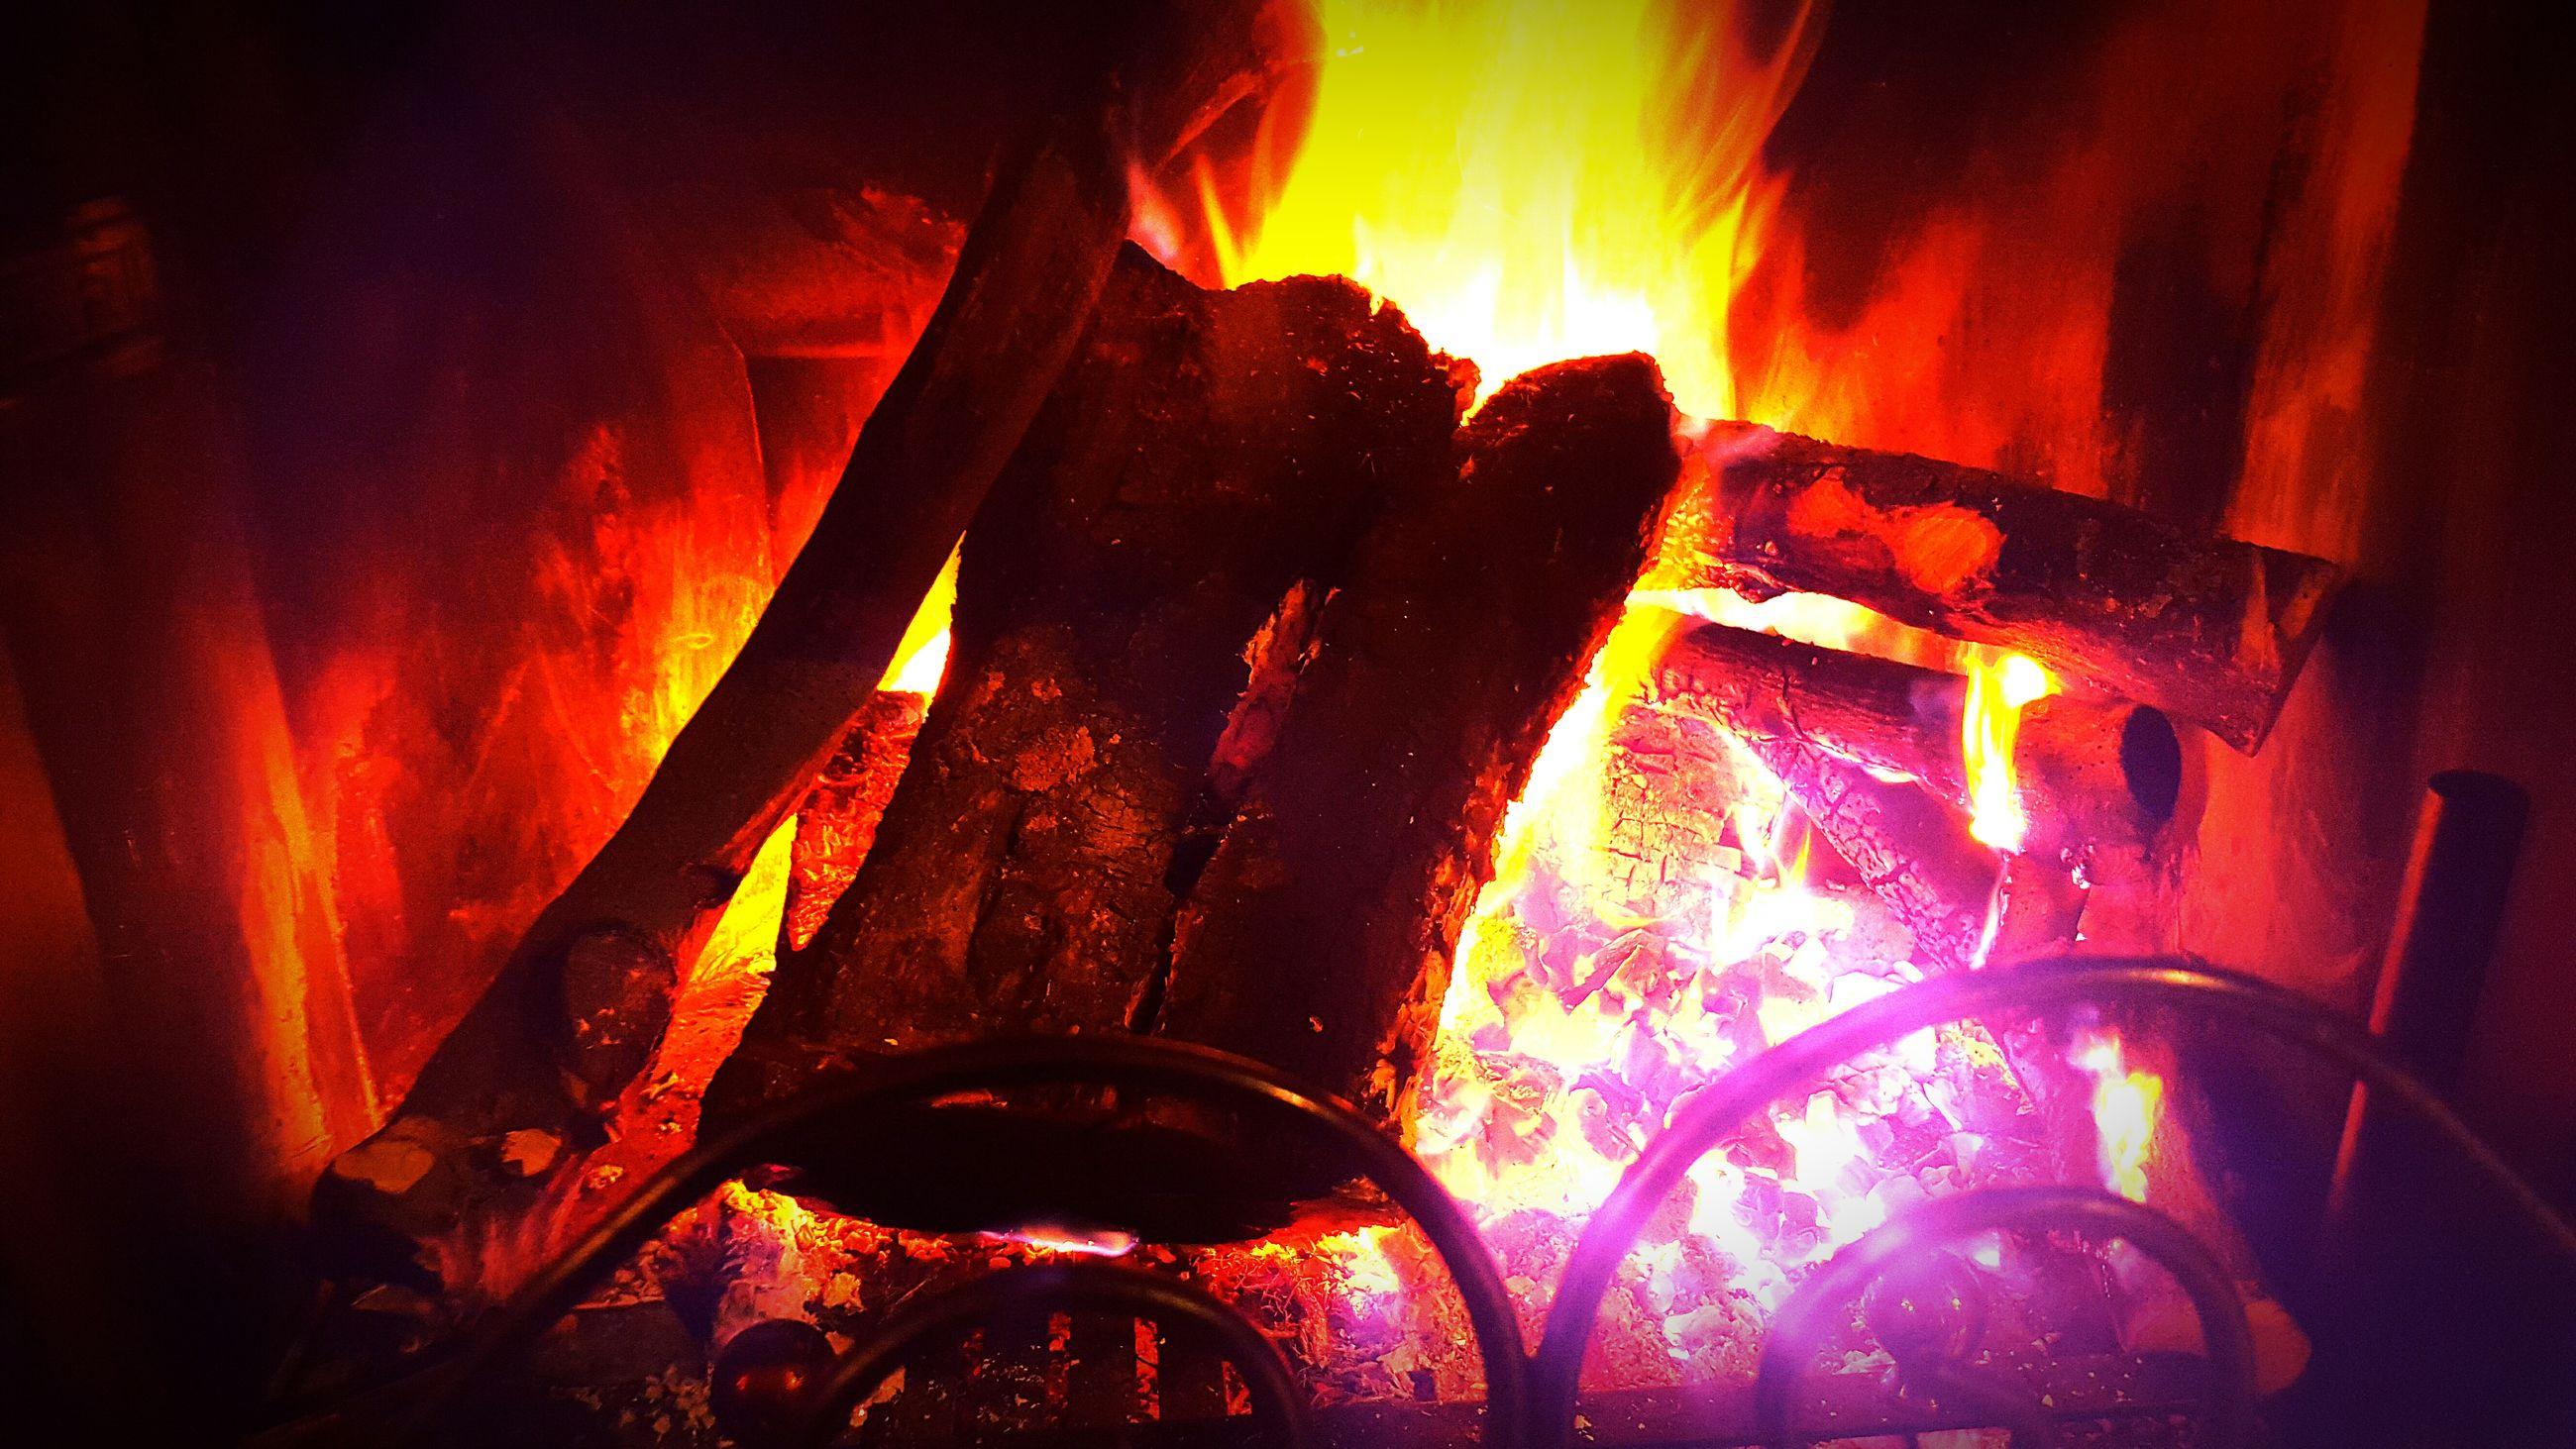 illuminated, fire - natural phenomenon, burning, indoors, flame, night, glowing, heat - temperature, light - natural phenomenon, lighting equipment, close-up, red, lit, candle, orange color, dark, spirituality, religion, fire